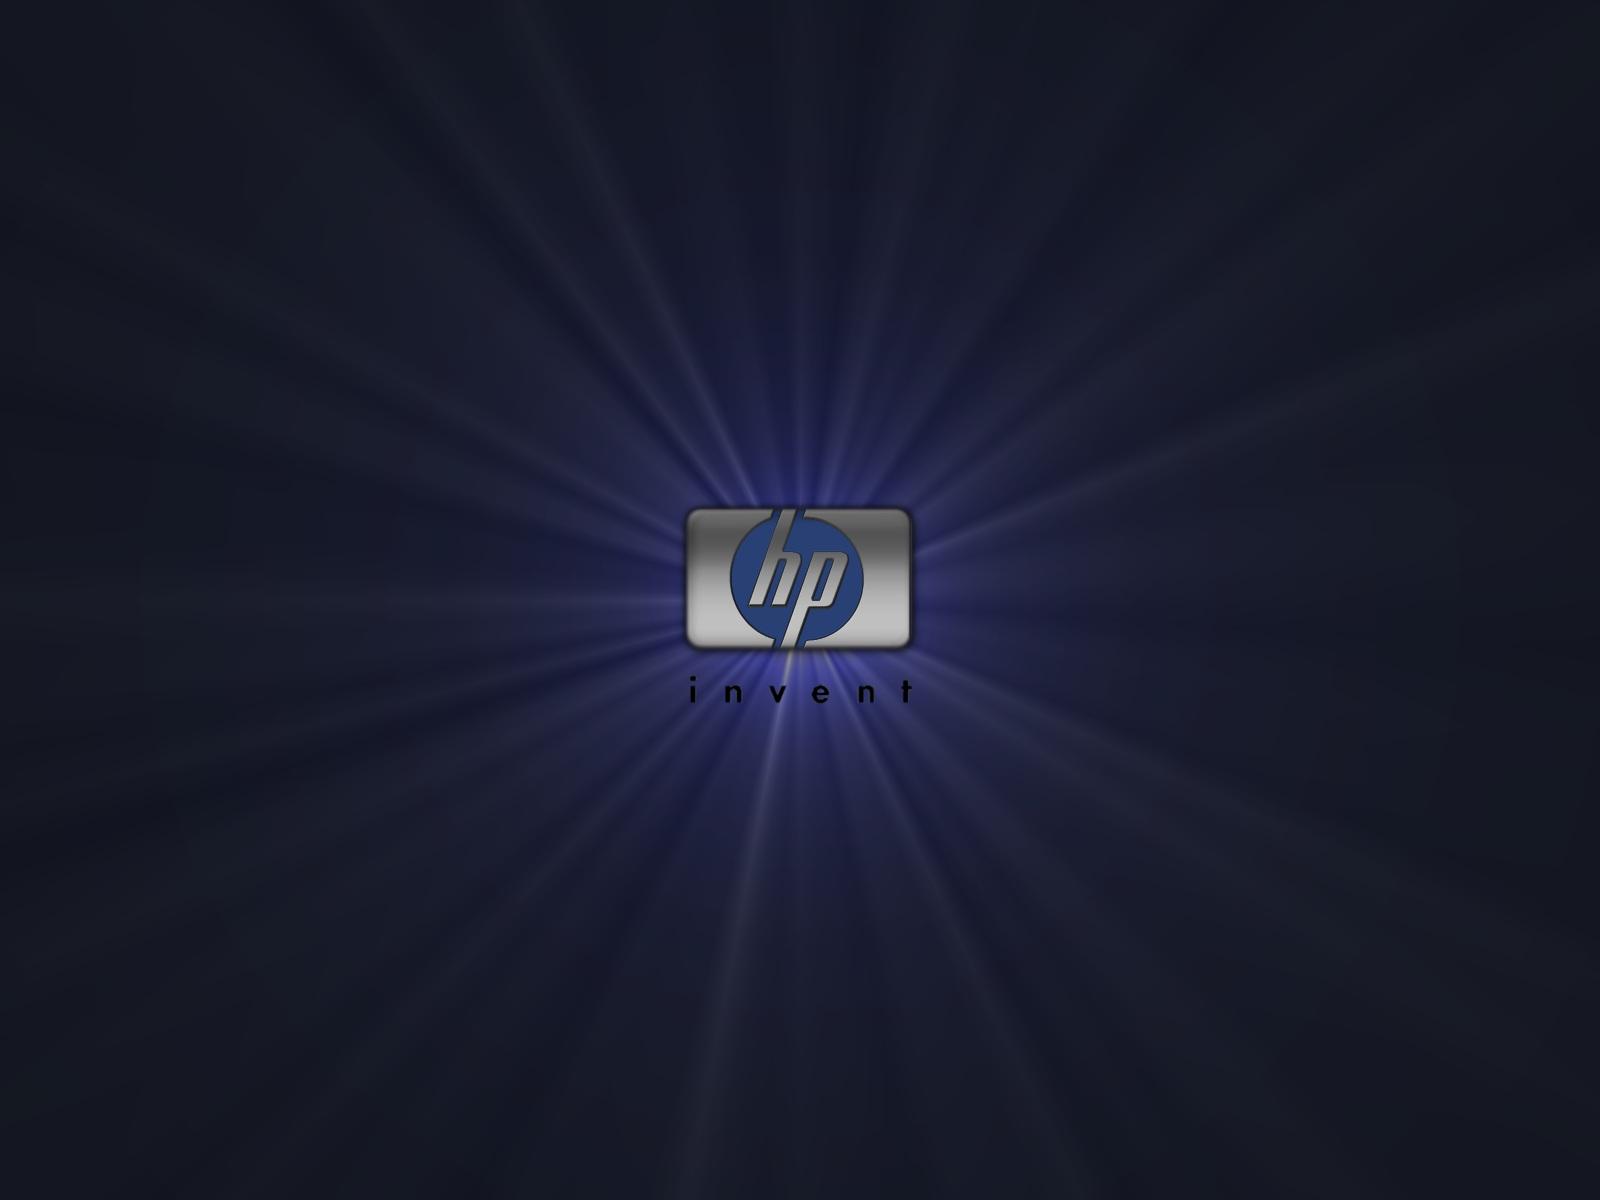 http://4.bp.blogspot.com/-WVZgKDRxAKY/TZSLeeMi8sI/AAAAAAAAA_M/9Lo3FMJMXic/s1600/hp%20laptop%20wallpaper%20%2816%29.jpg